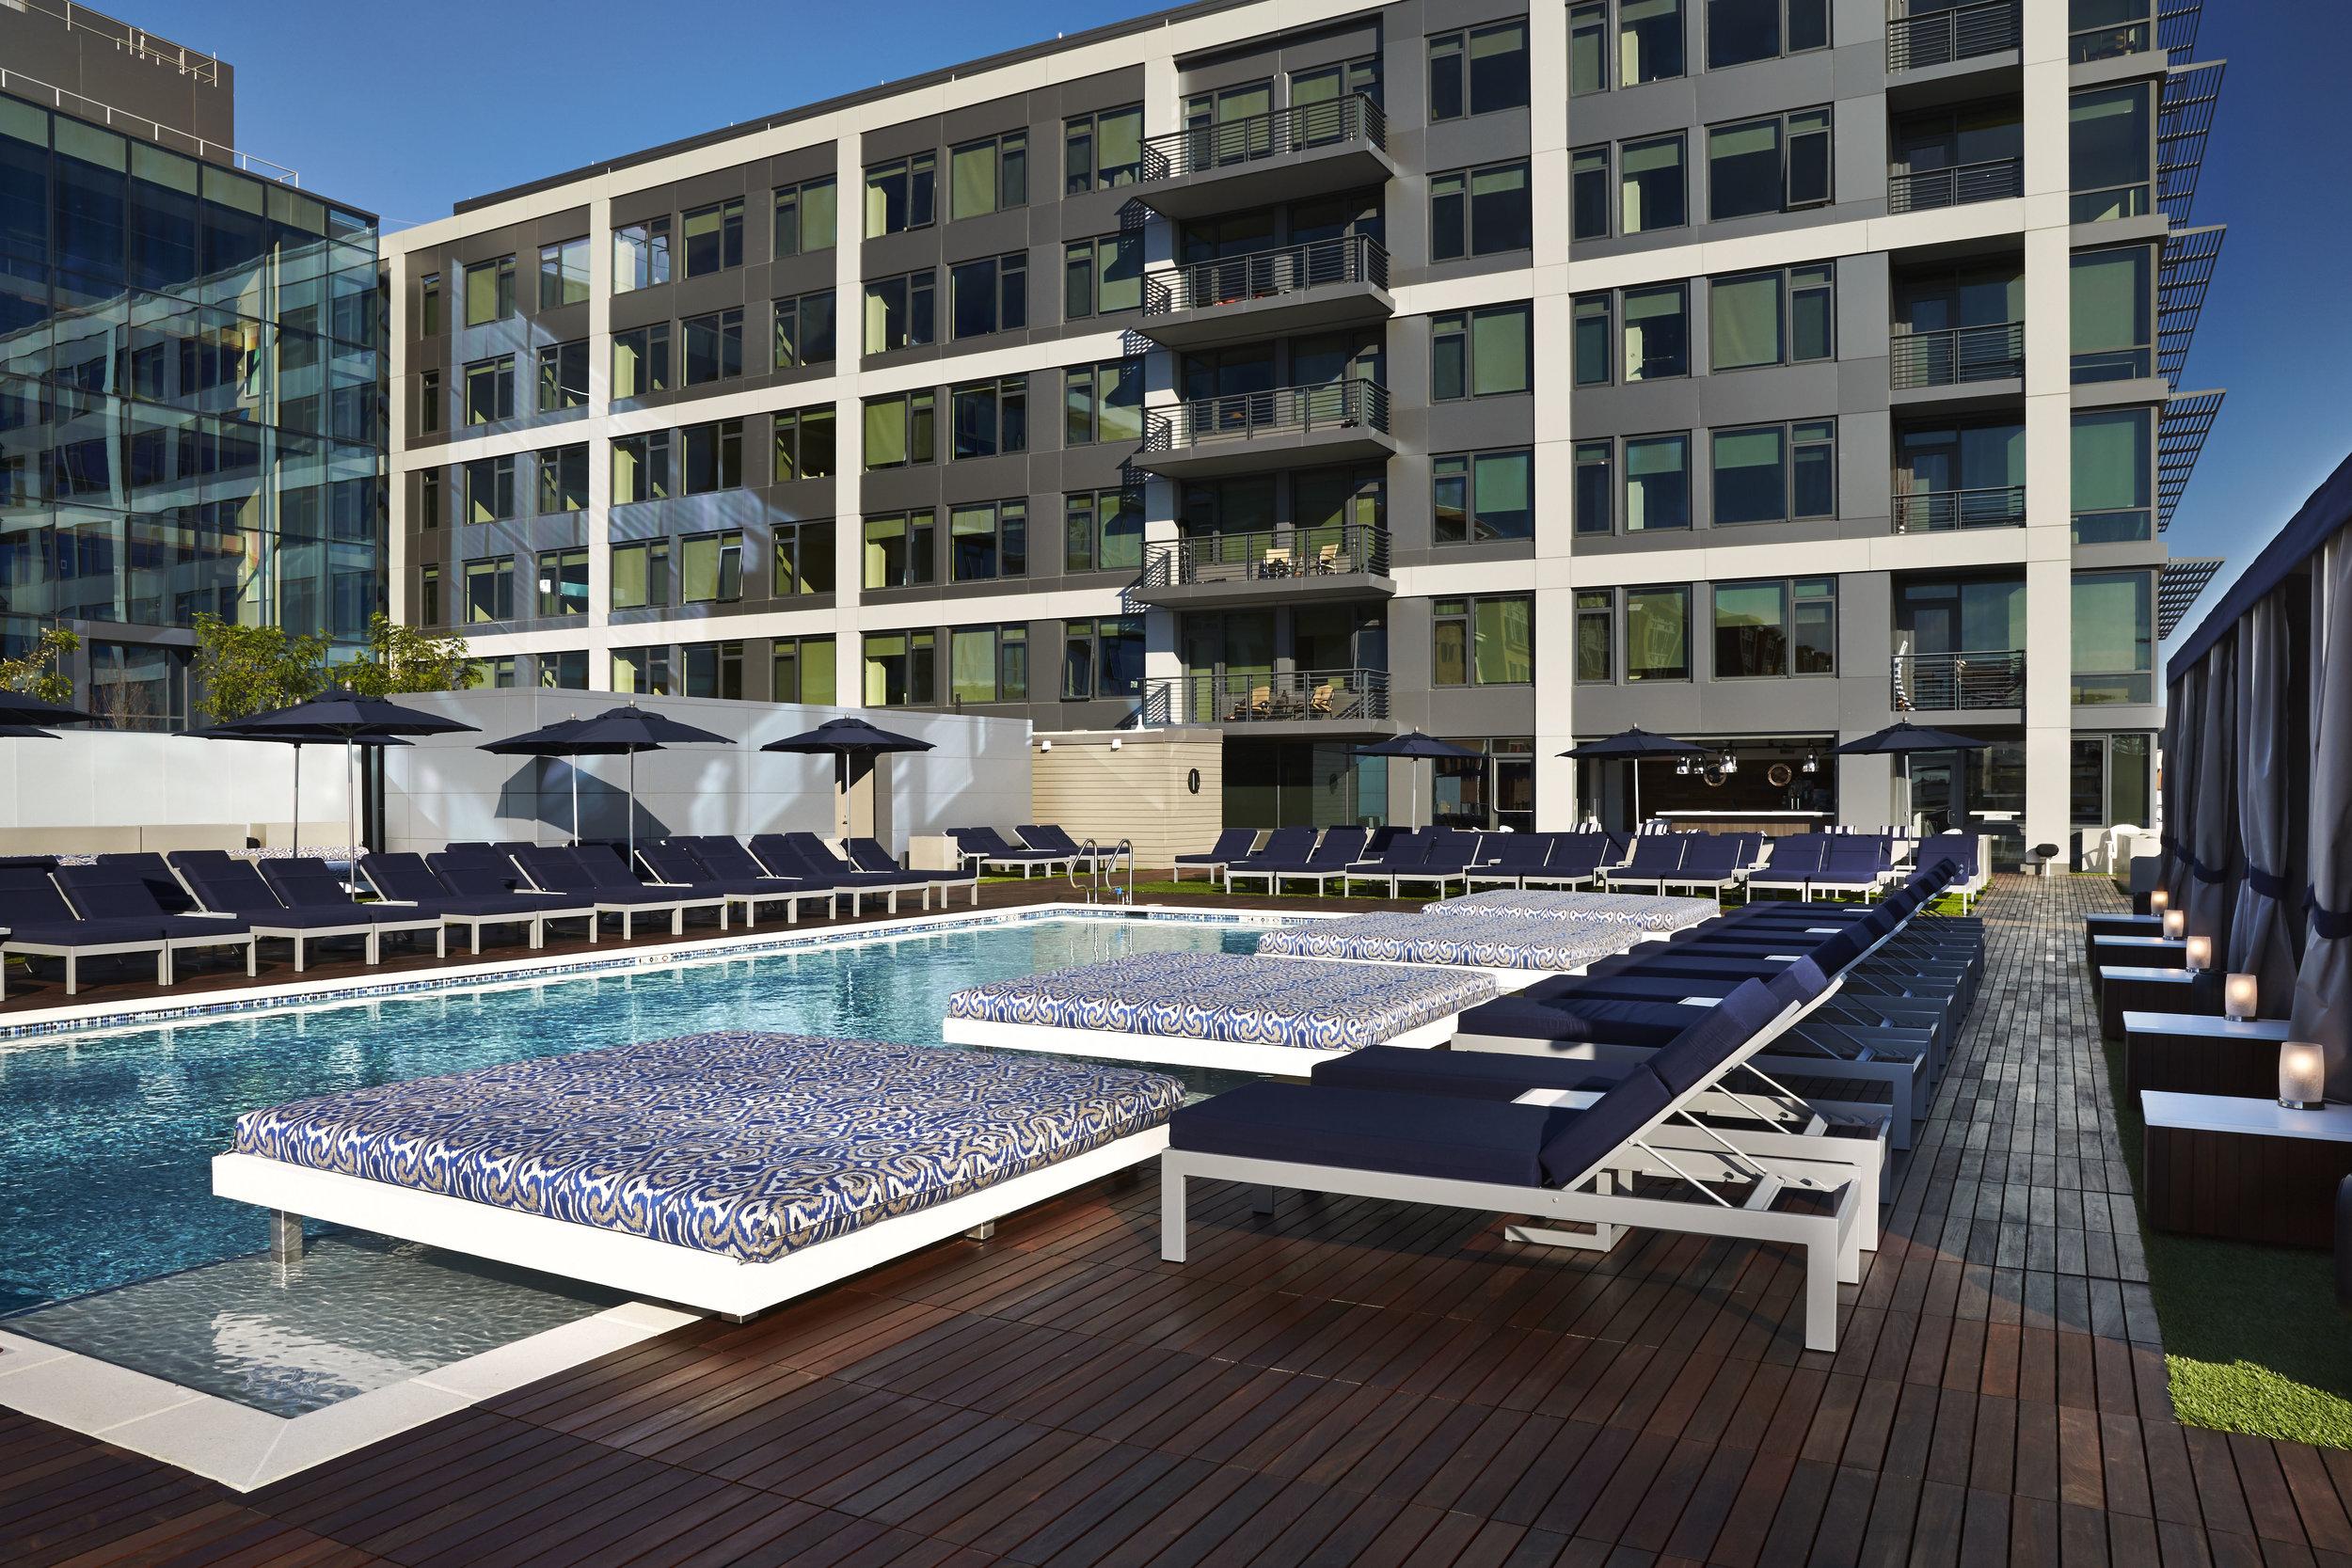 Penthouse Pool Club @ Vida Fitness, WA, DC